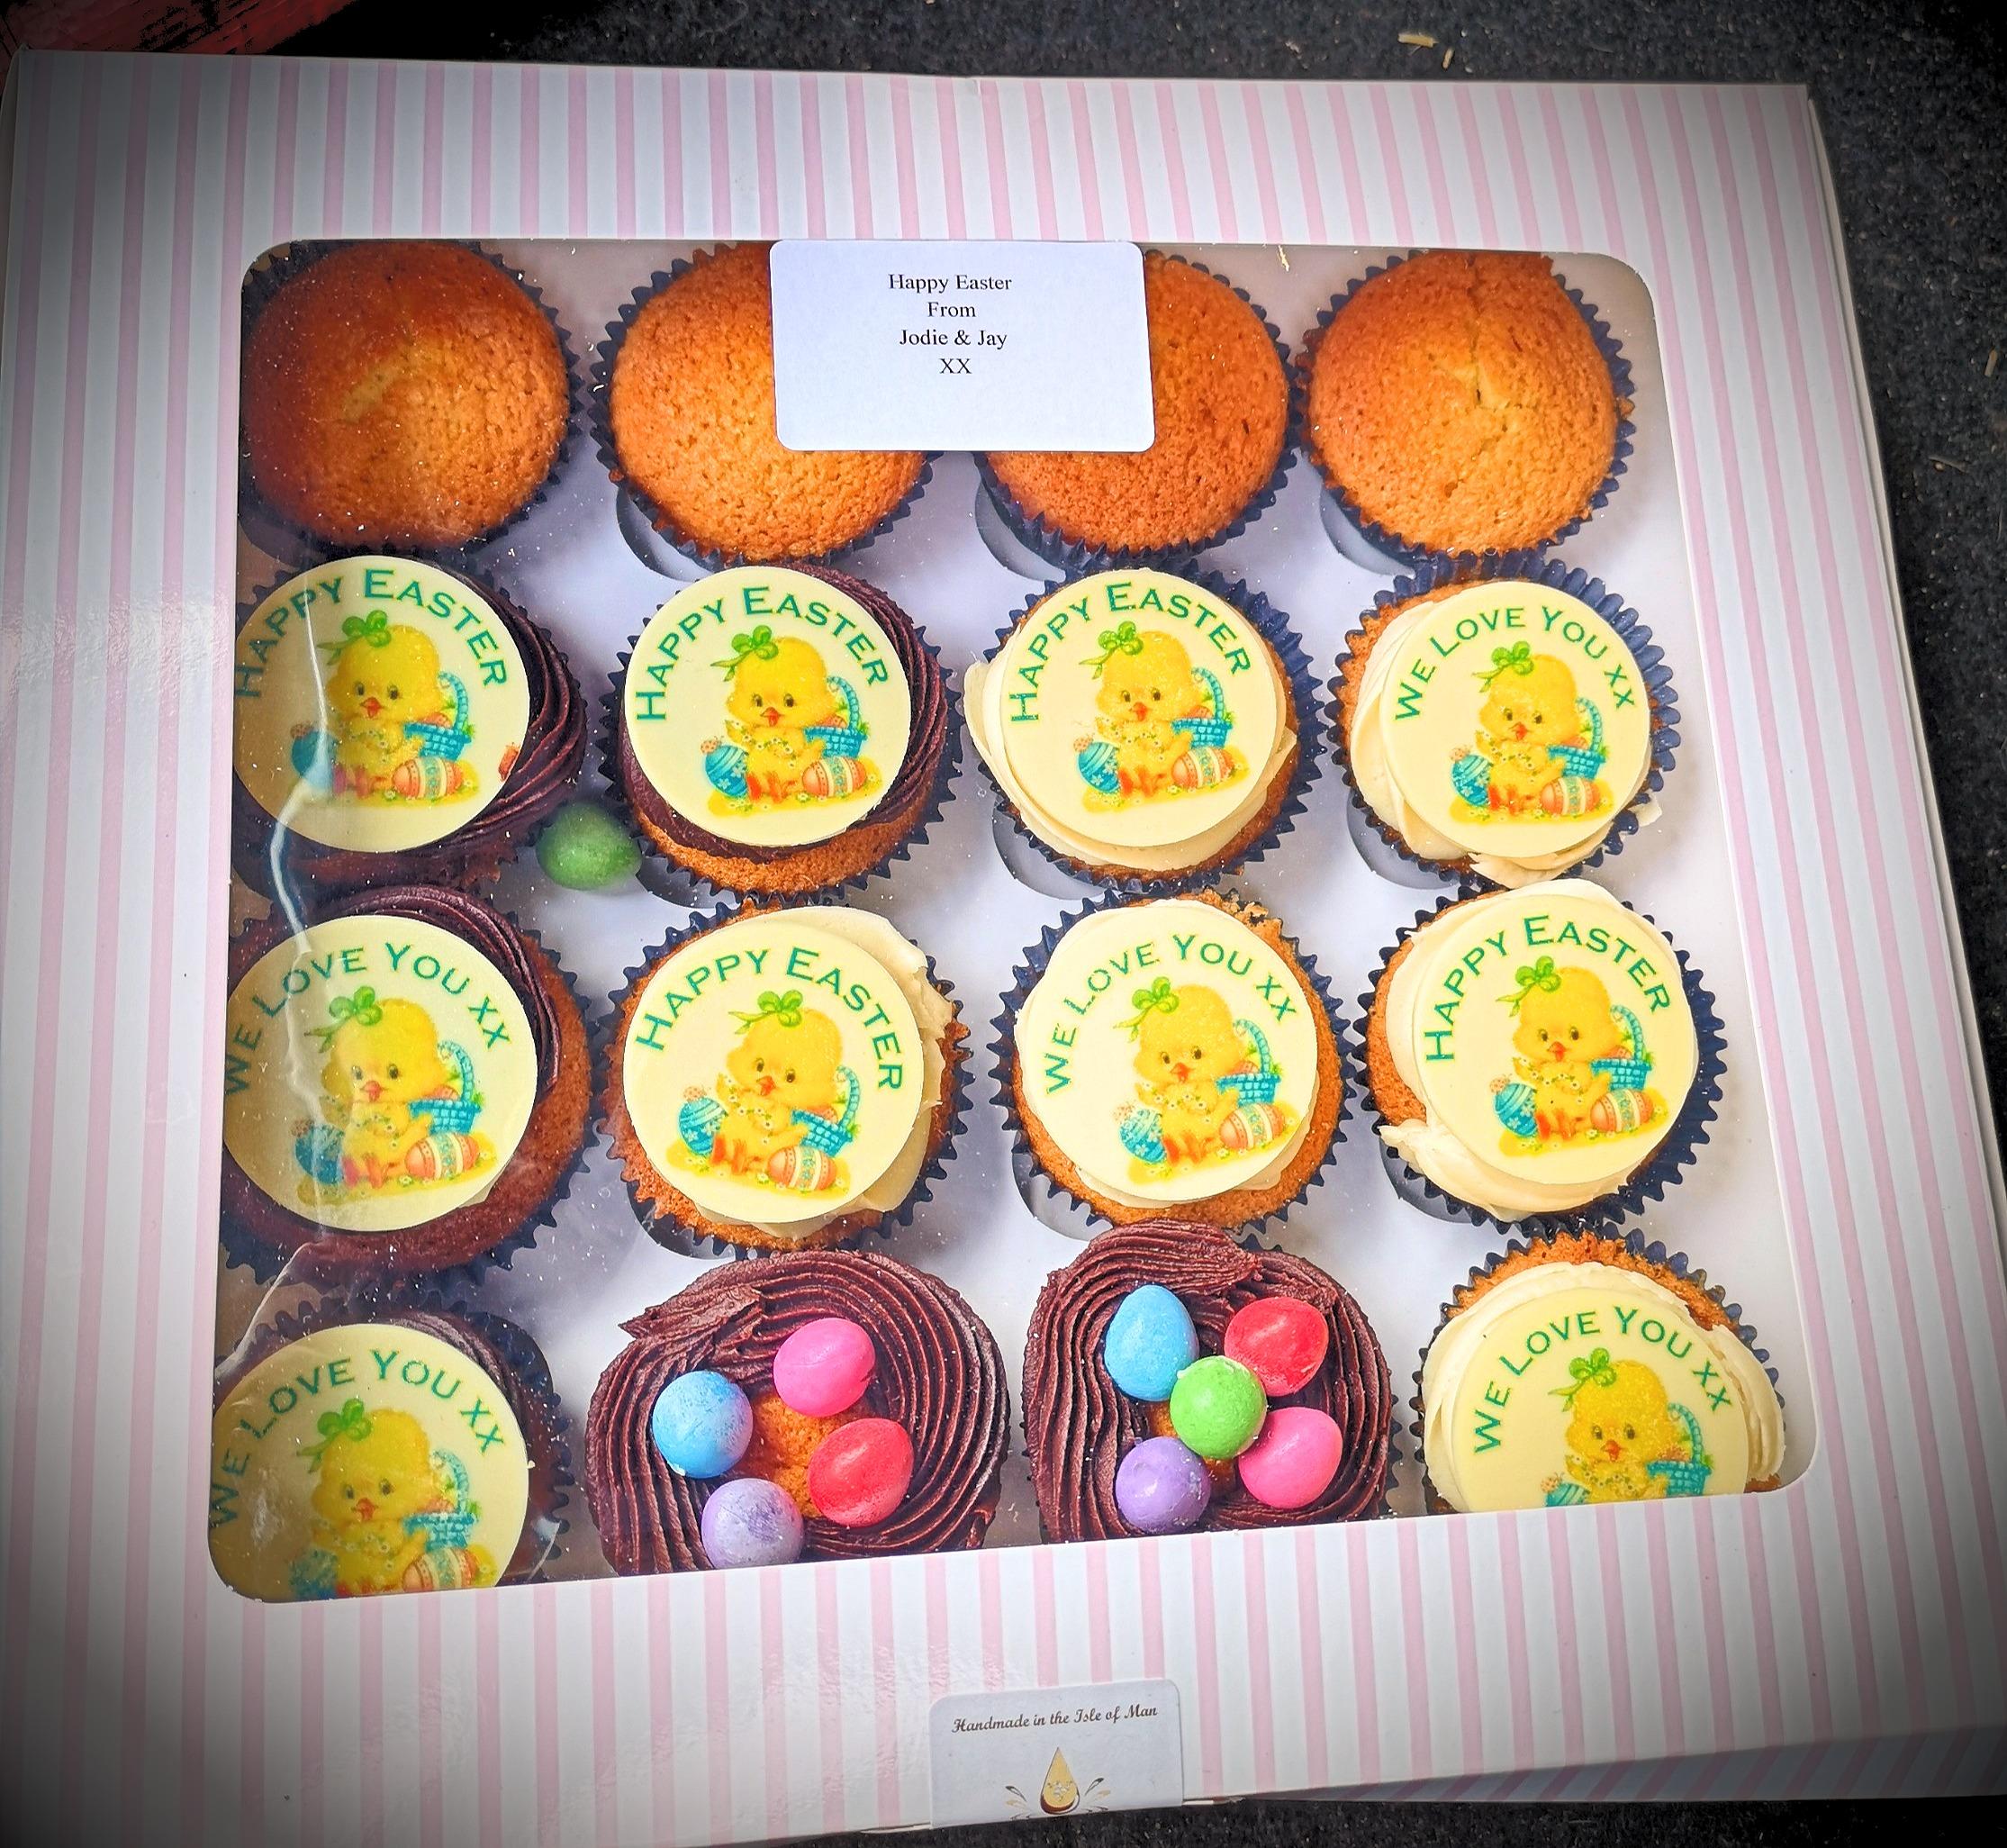 16 Personalised Cupcakes